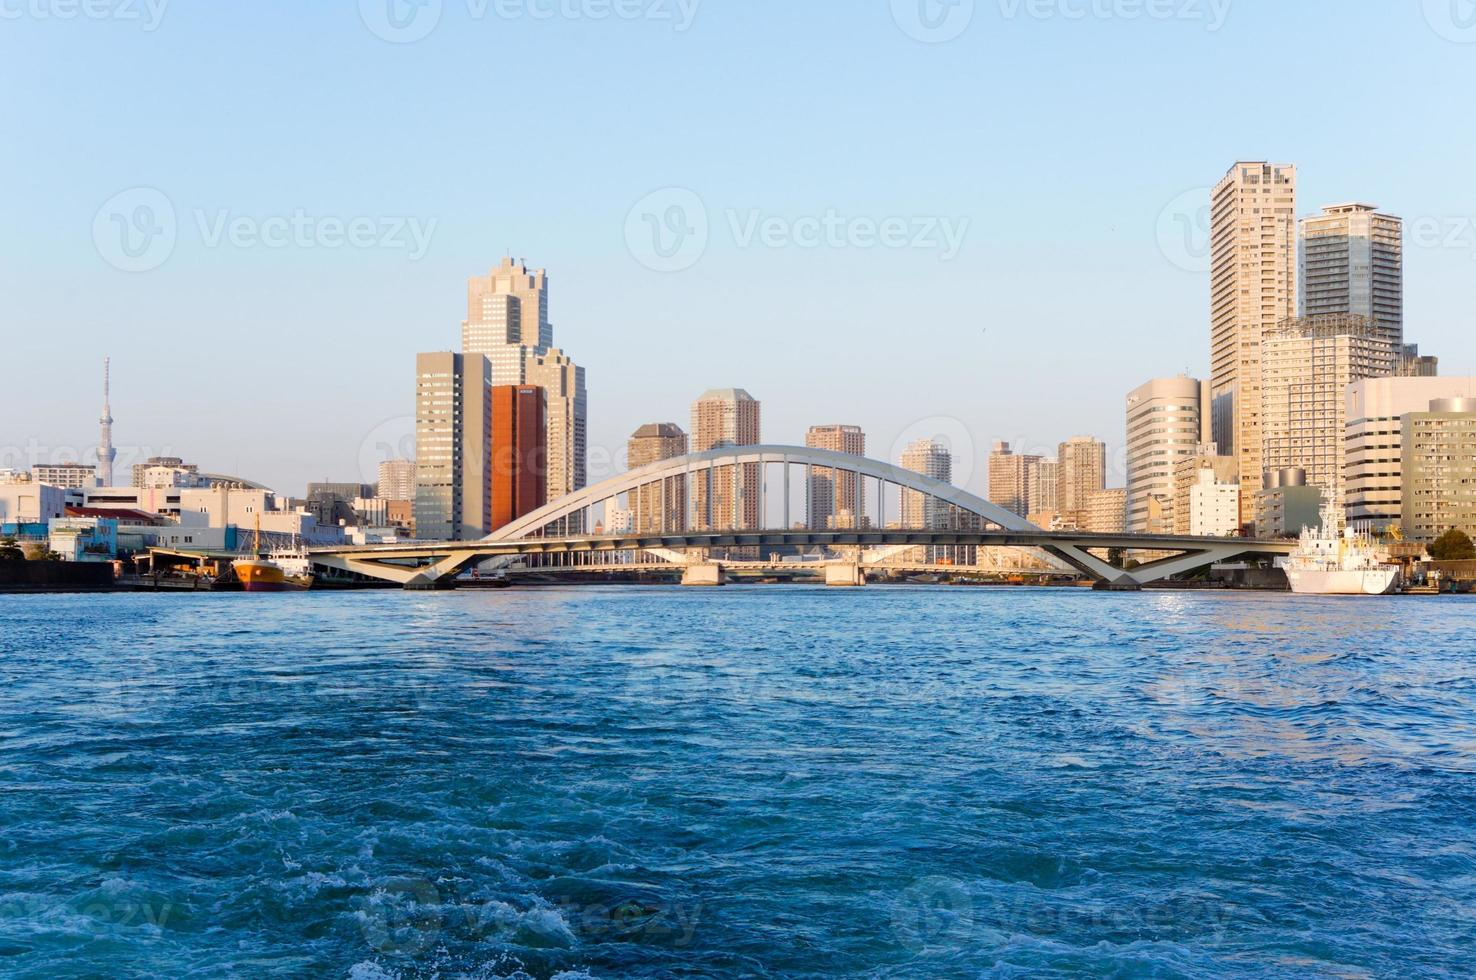 vue sur la rivière sumida photo